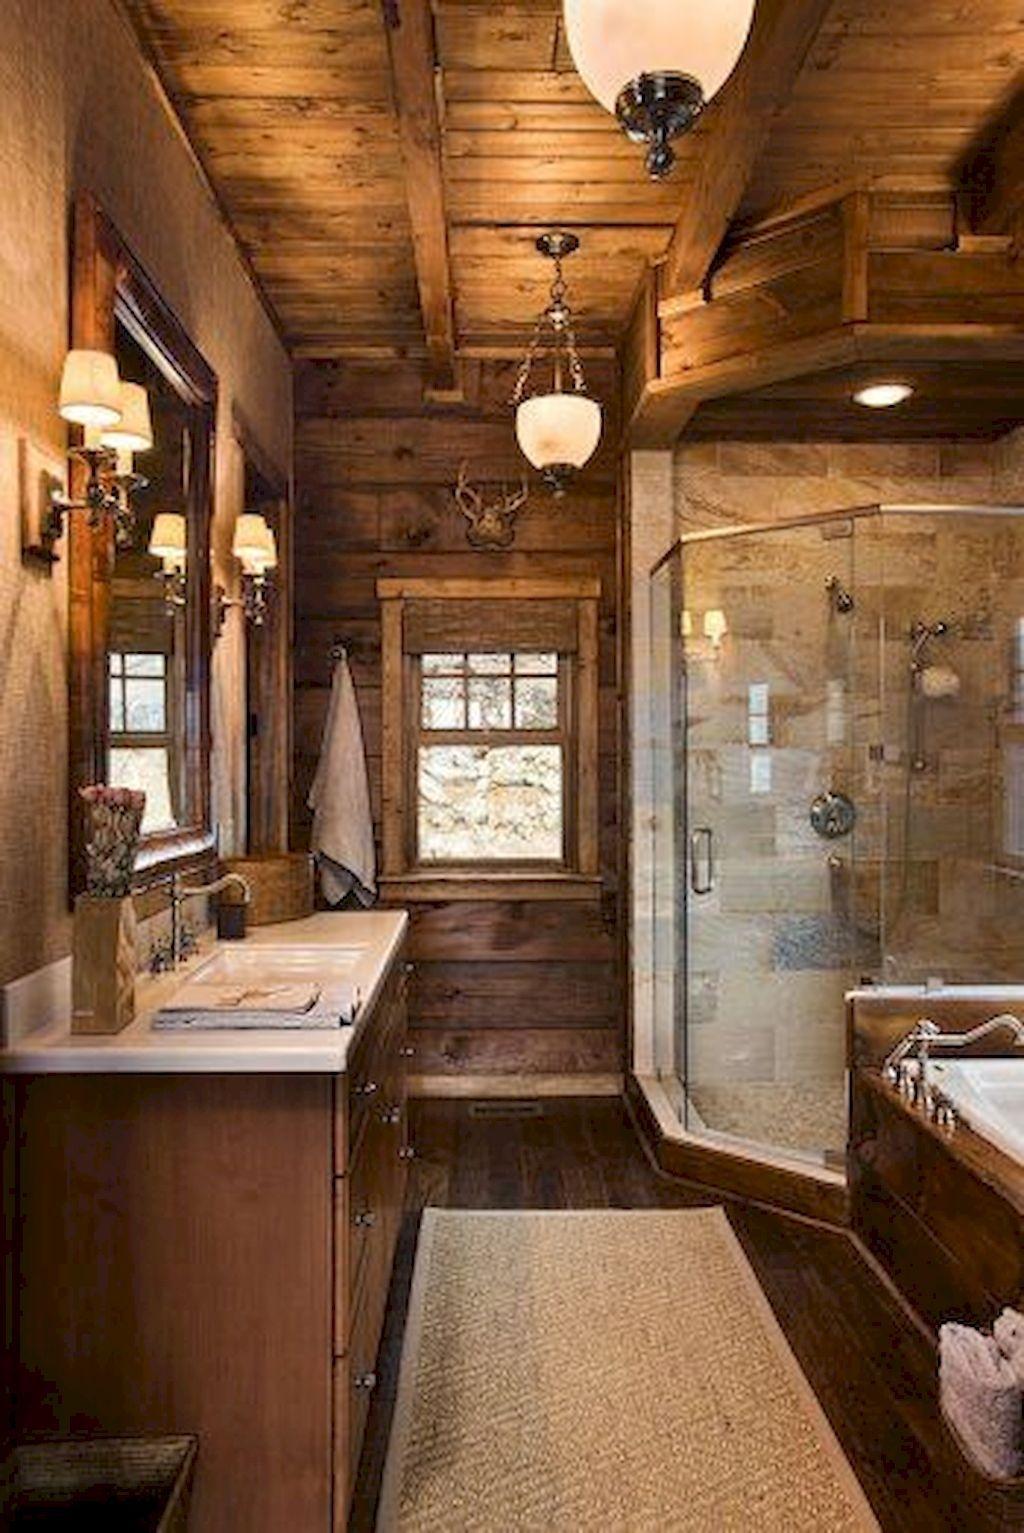 Simple And Cozy Wooden Bathroom Remodel Ideas 16